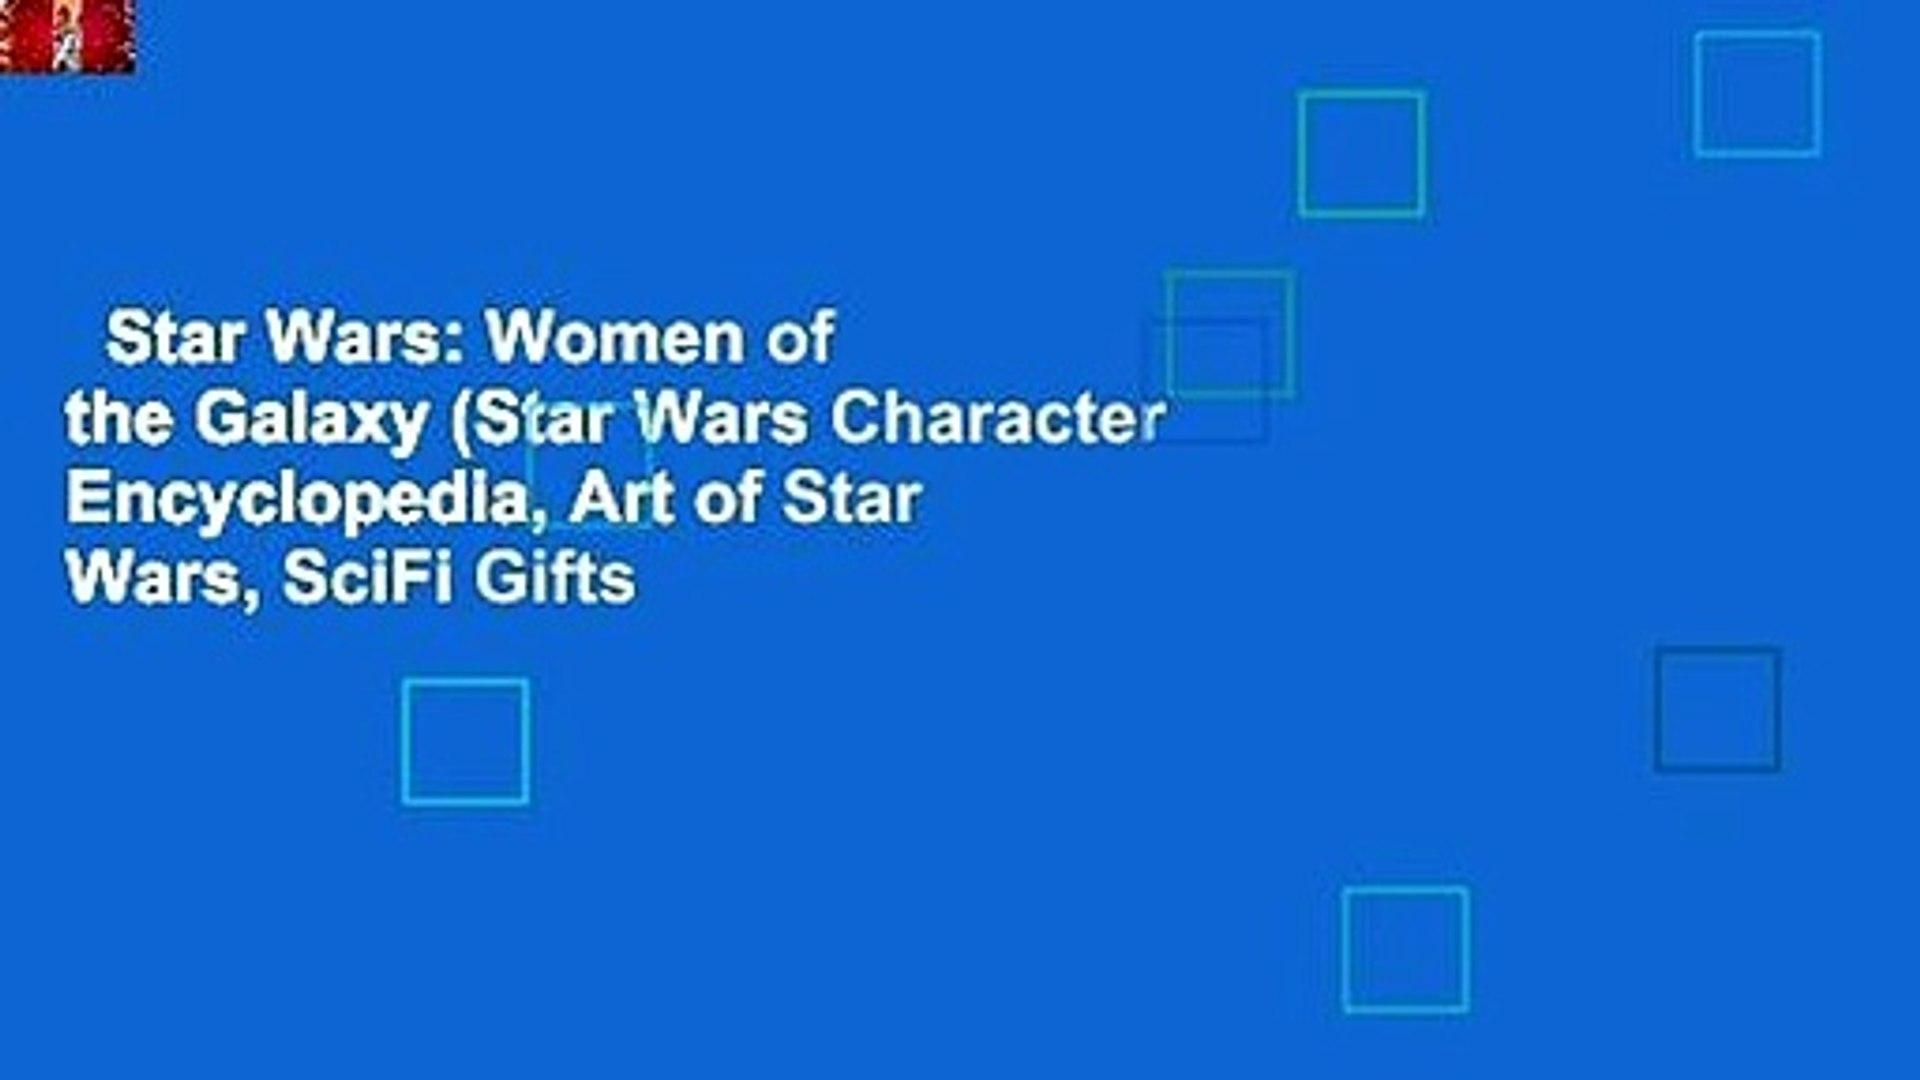 Star Wars: Women of the Galaxy (Star Wars Character Encyclopedia, Art of Star Wars, SciFi Gifts